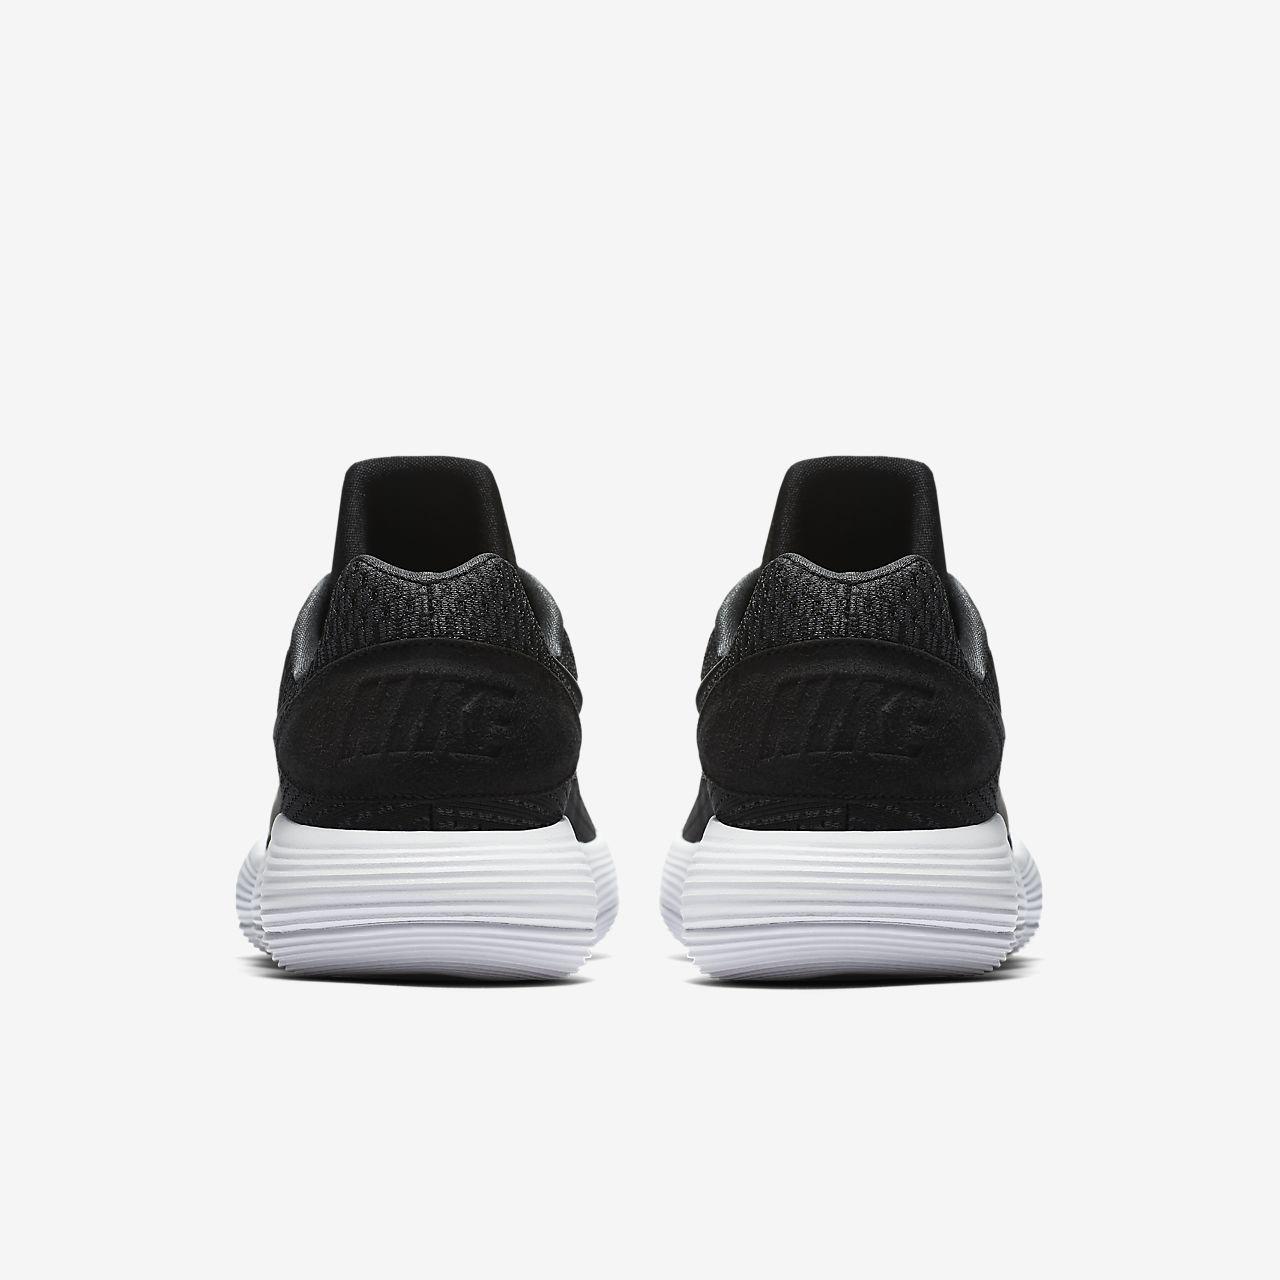 the latest a9fa0 39596 nike id hyperdunk basketball shoes with lunarlon